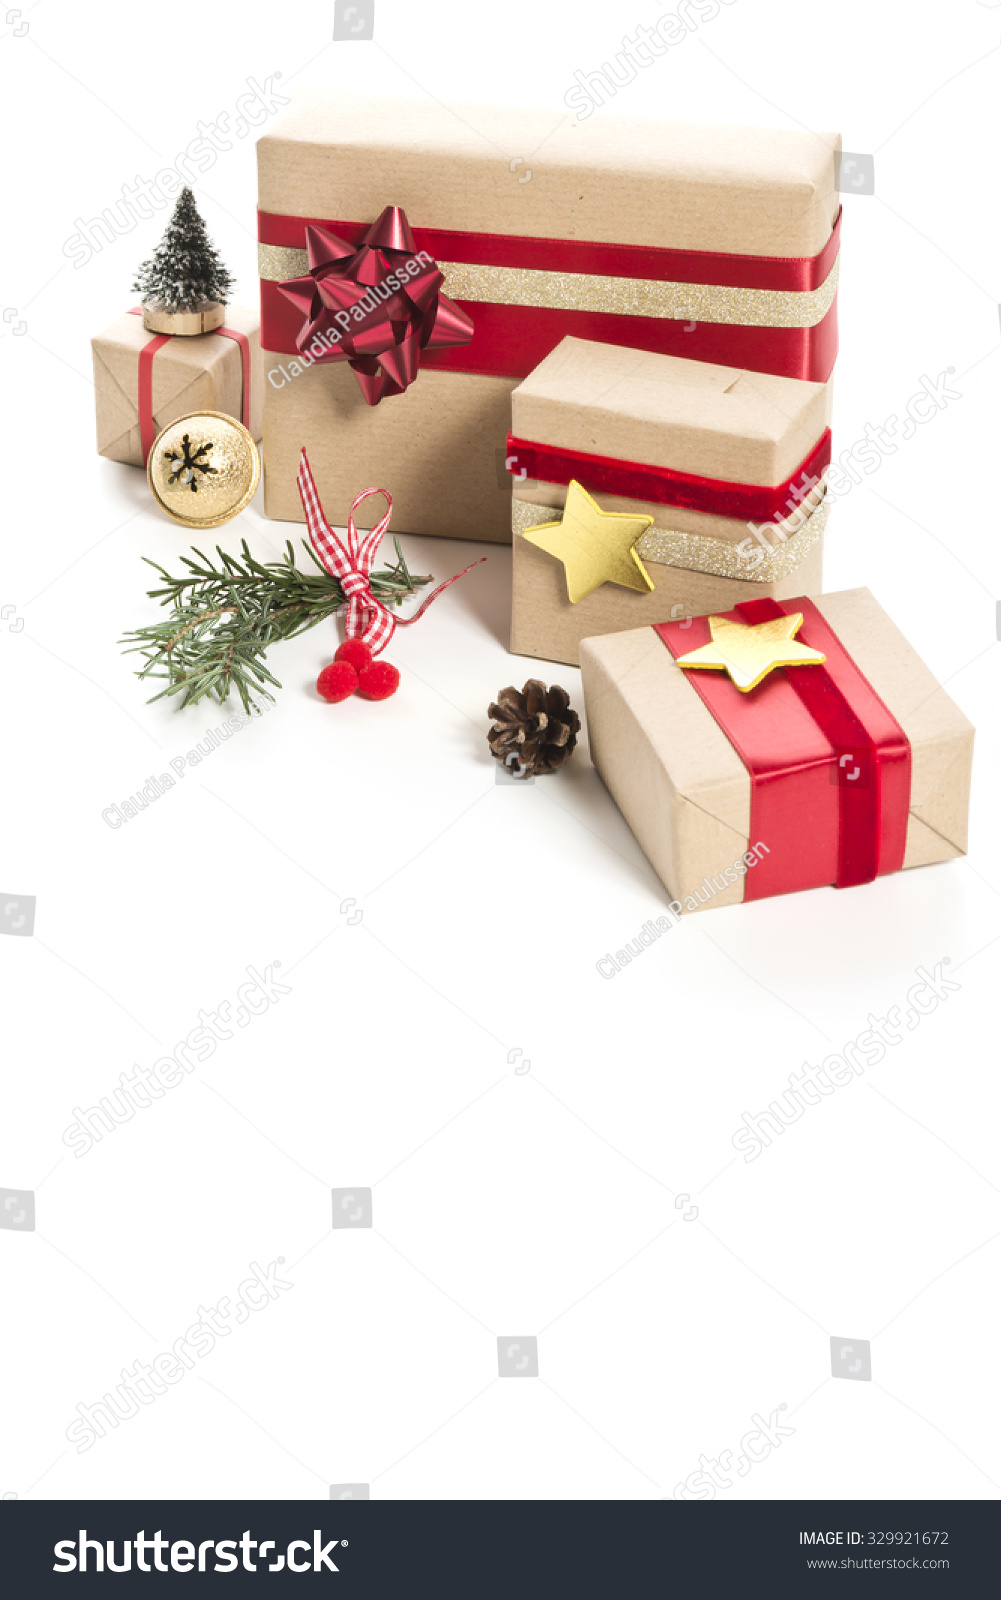 Christmas Presents Decoration On White Background Stock Photo (Edit ...